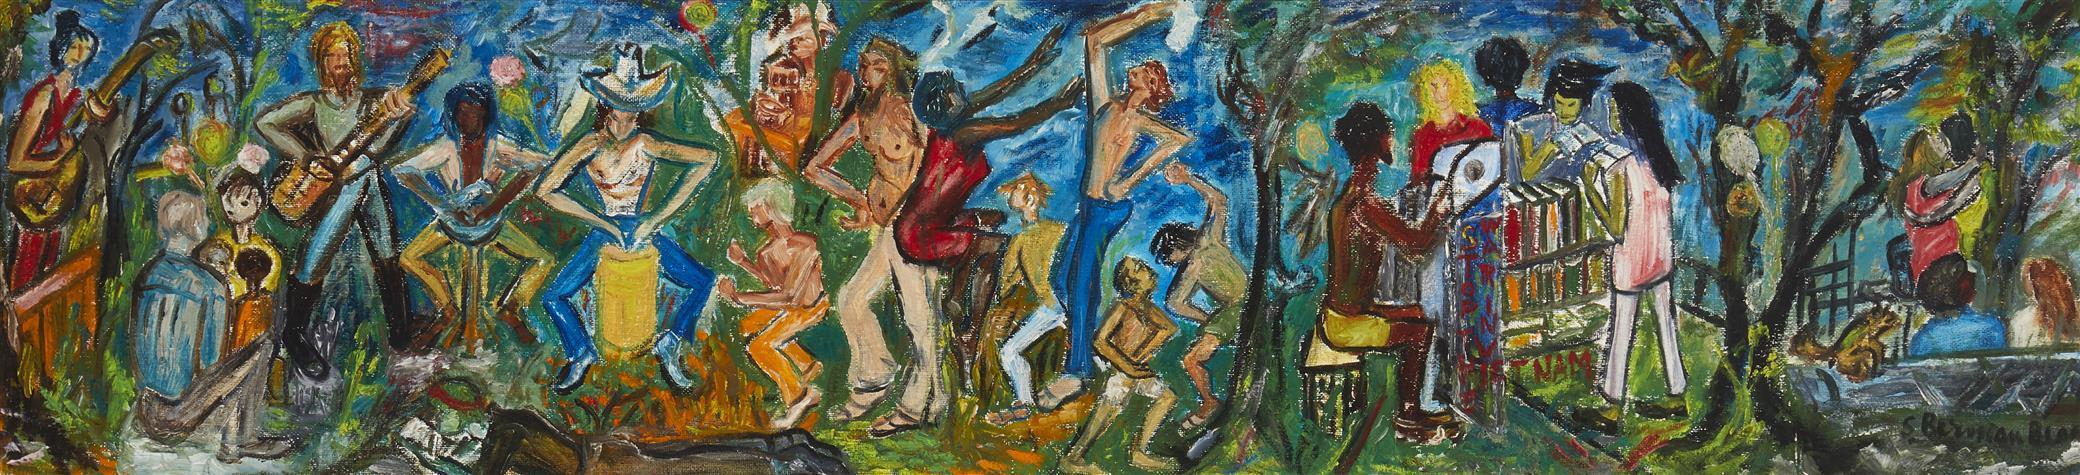 "Sara Berman Beach, (1890-1978, American), ""Stop the War in Vietnam"", Oil on canvasboard, 11"" H x 47.25"" W"